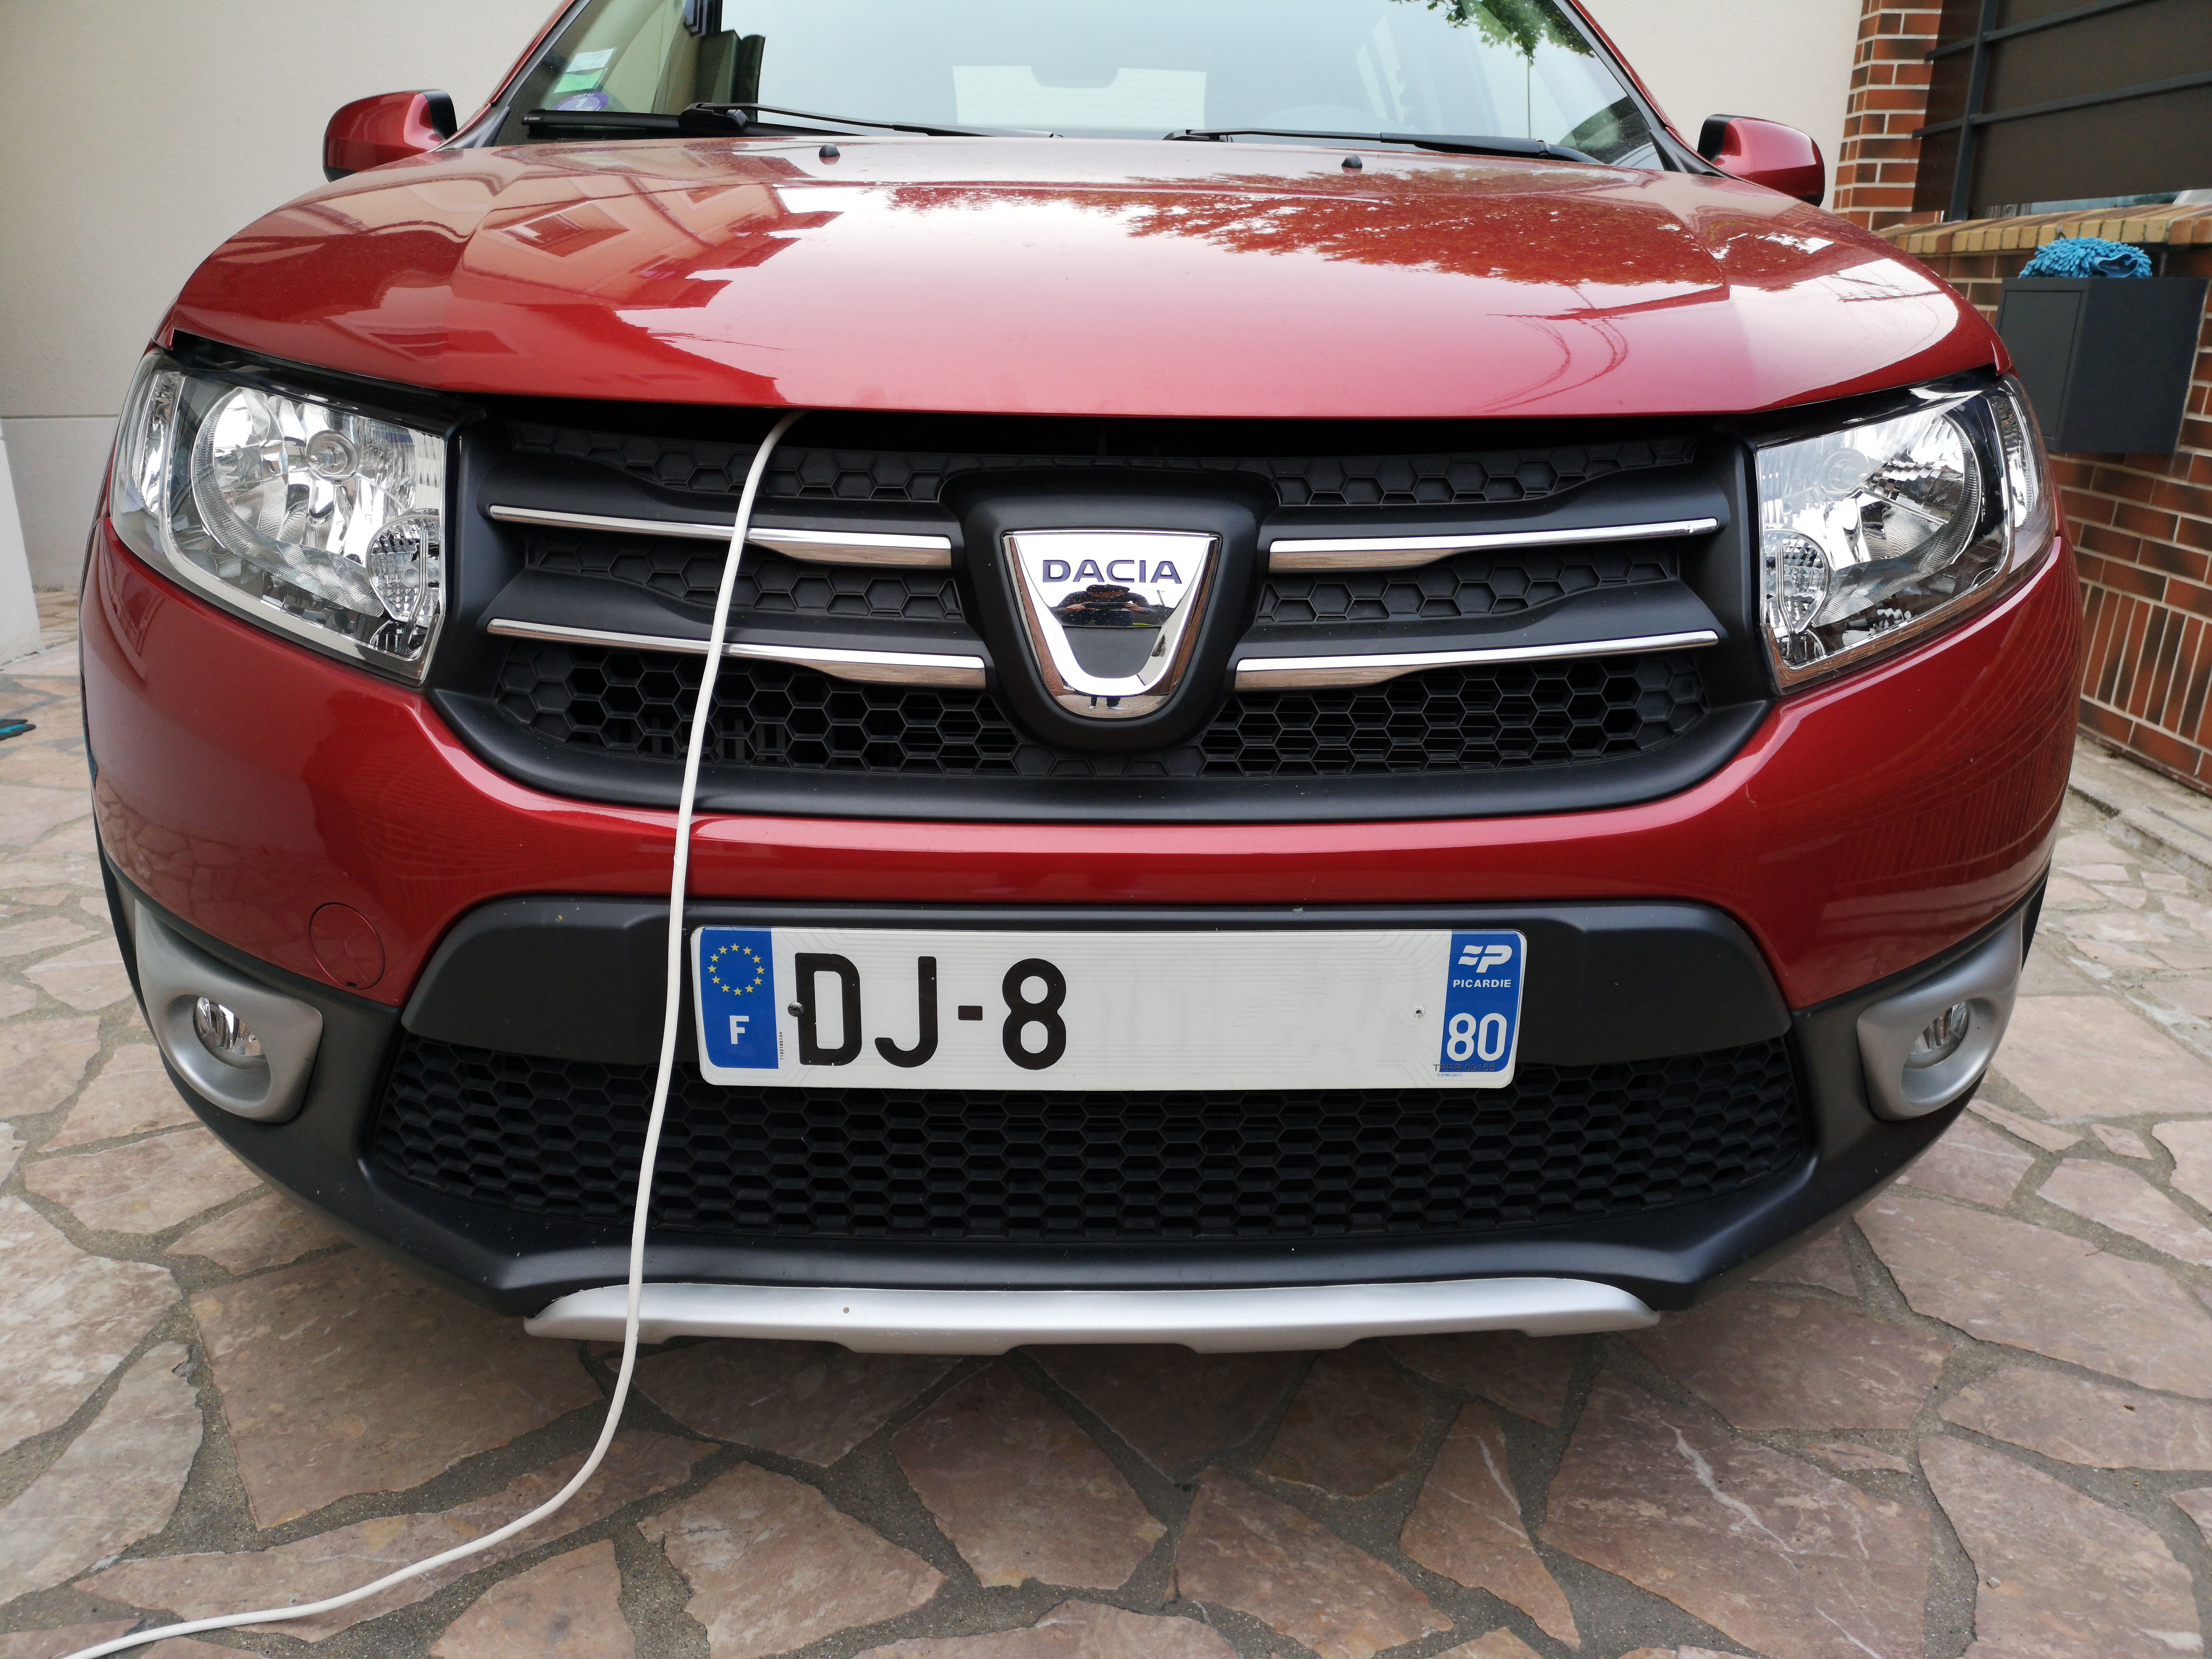 Dacia Sandero Batterie Recharge